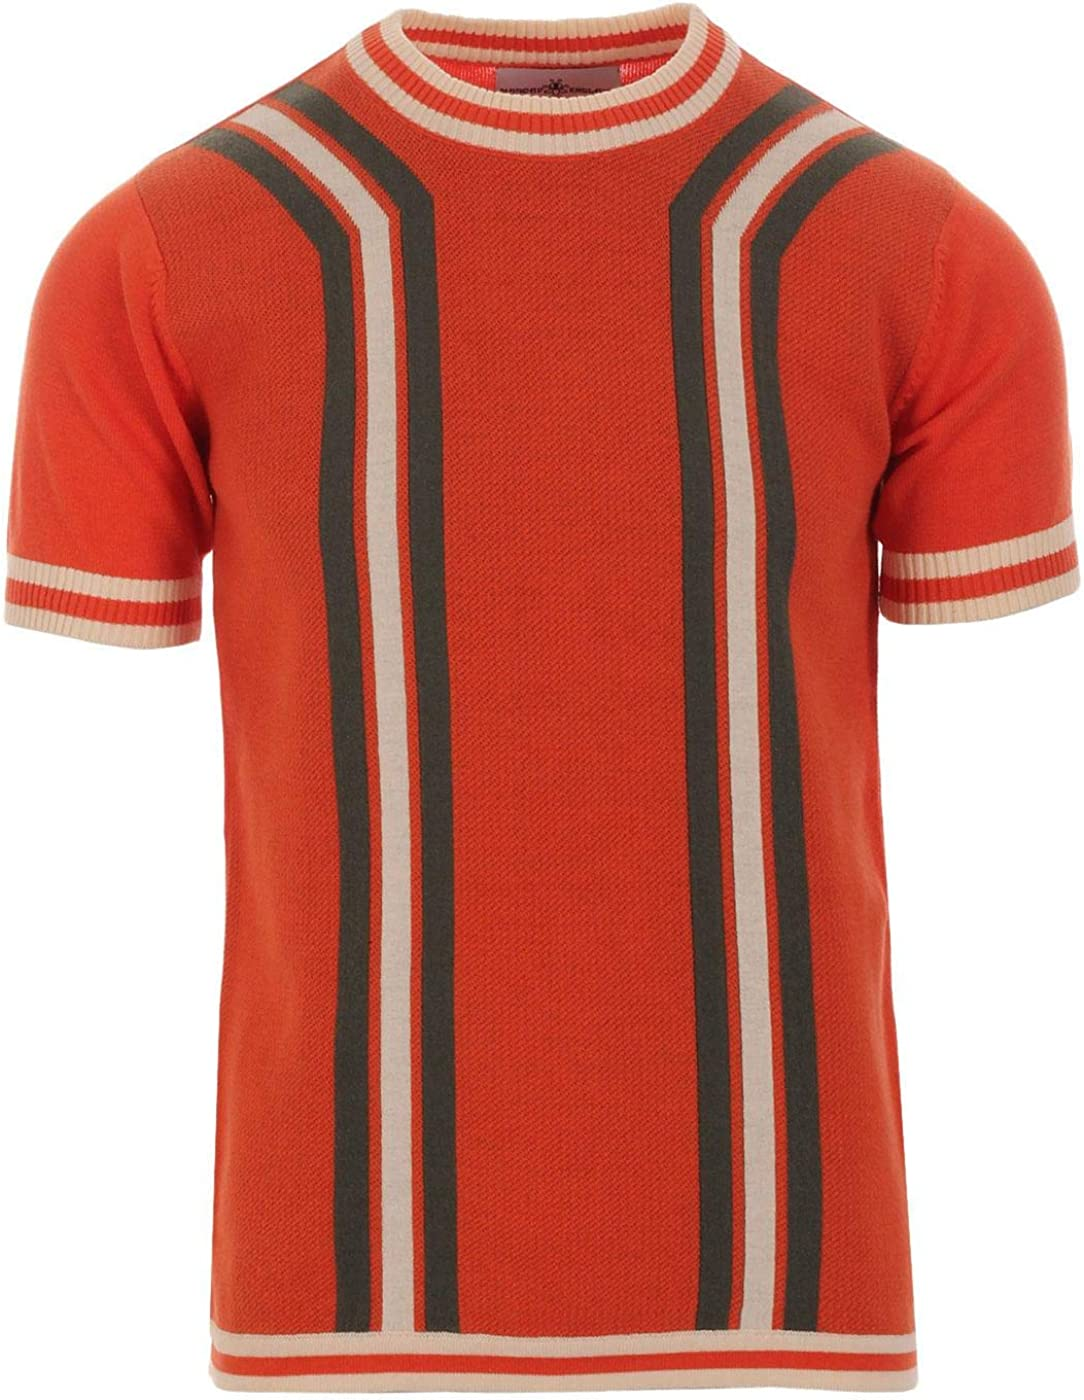 1960s Mens Shirts | 60s Mod Shirts, Hippie Shirts Madcap England Modernista Mens Retro 60s 70s Waffle Knit Short Sleeve Knitted Striped T-Shirt Jumper £29.99 AT vintagedancer.com